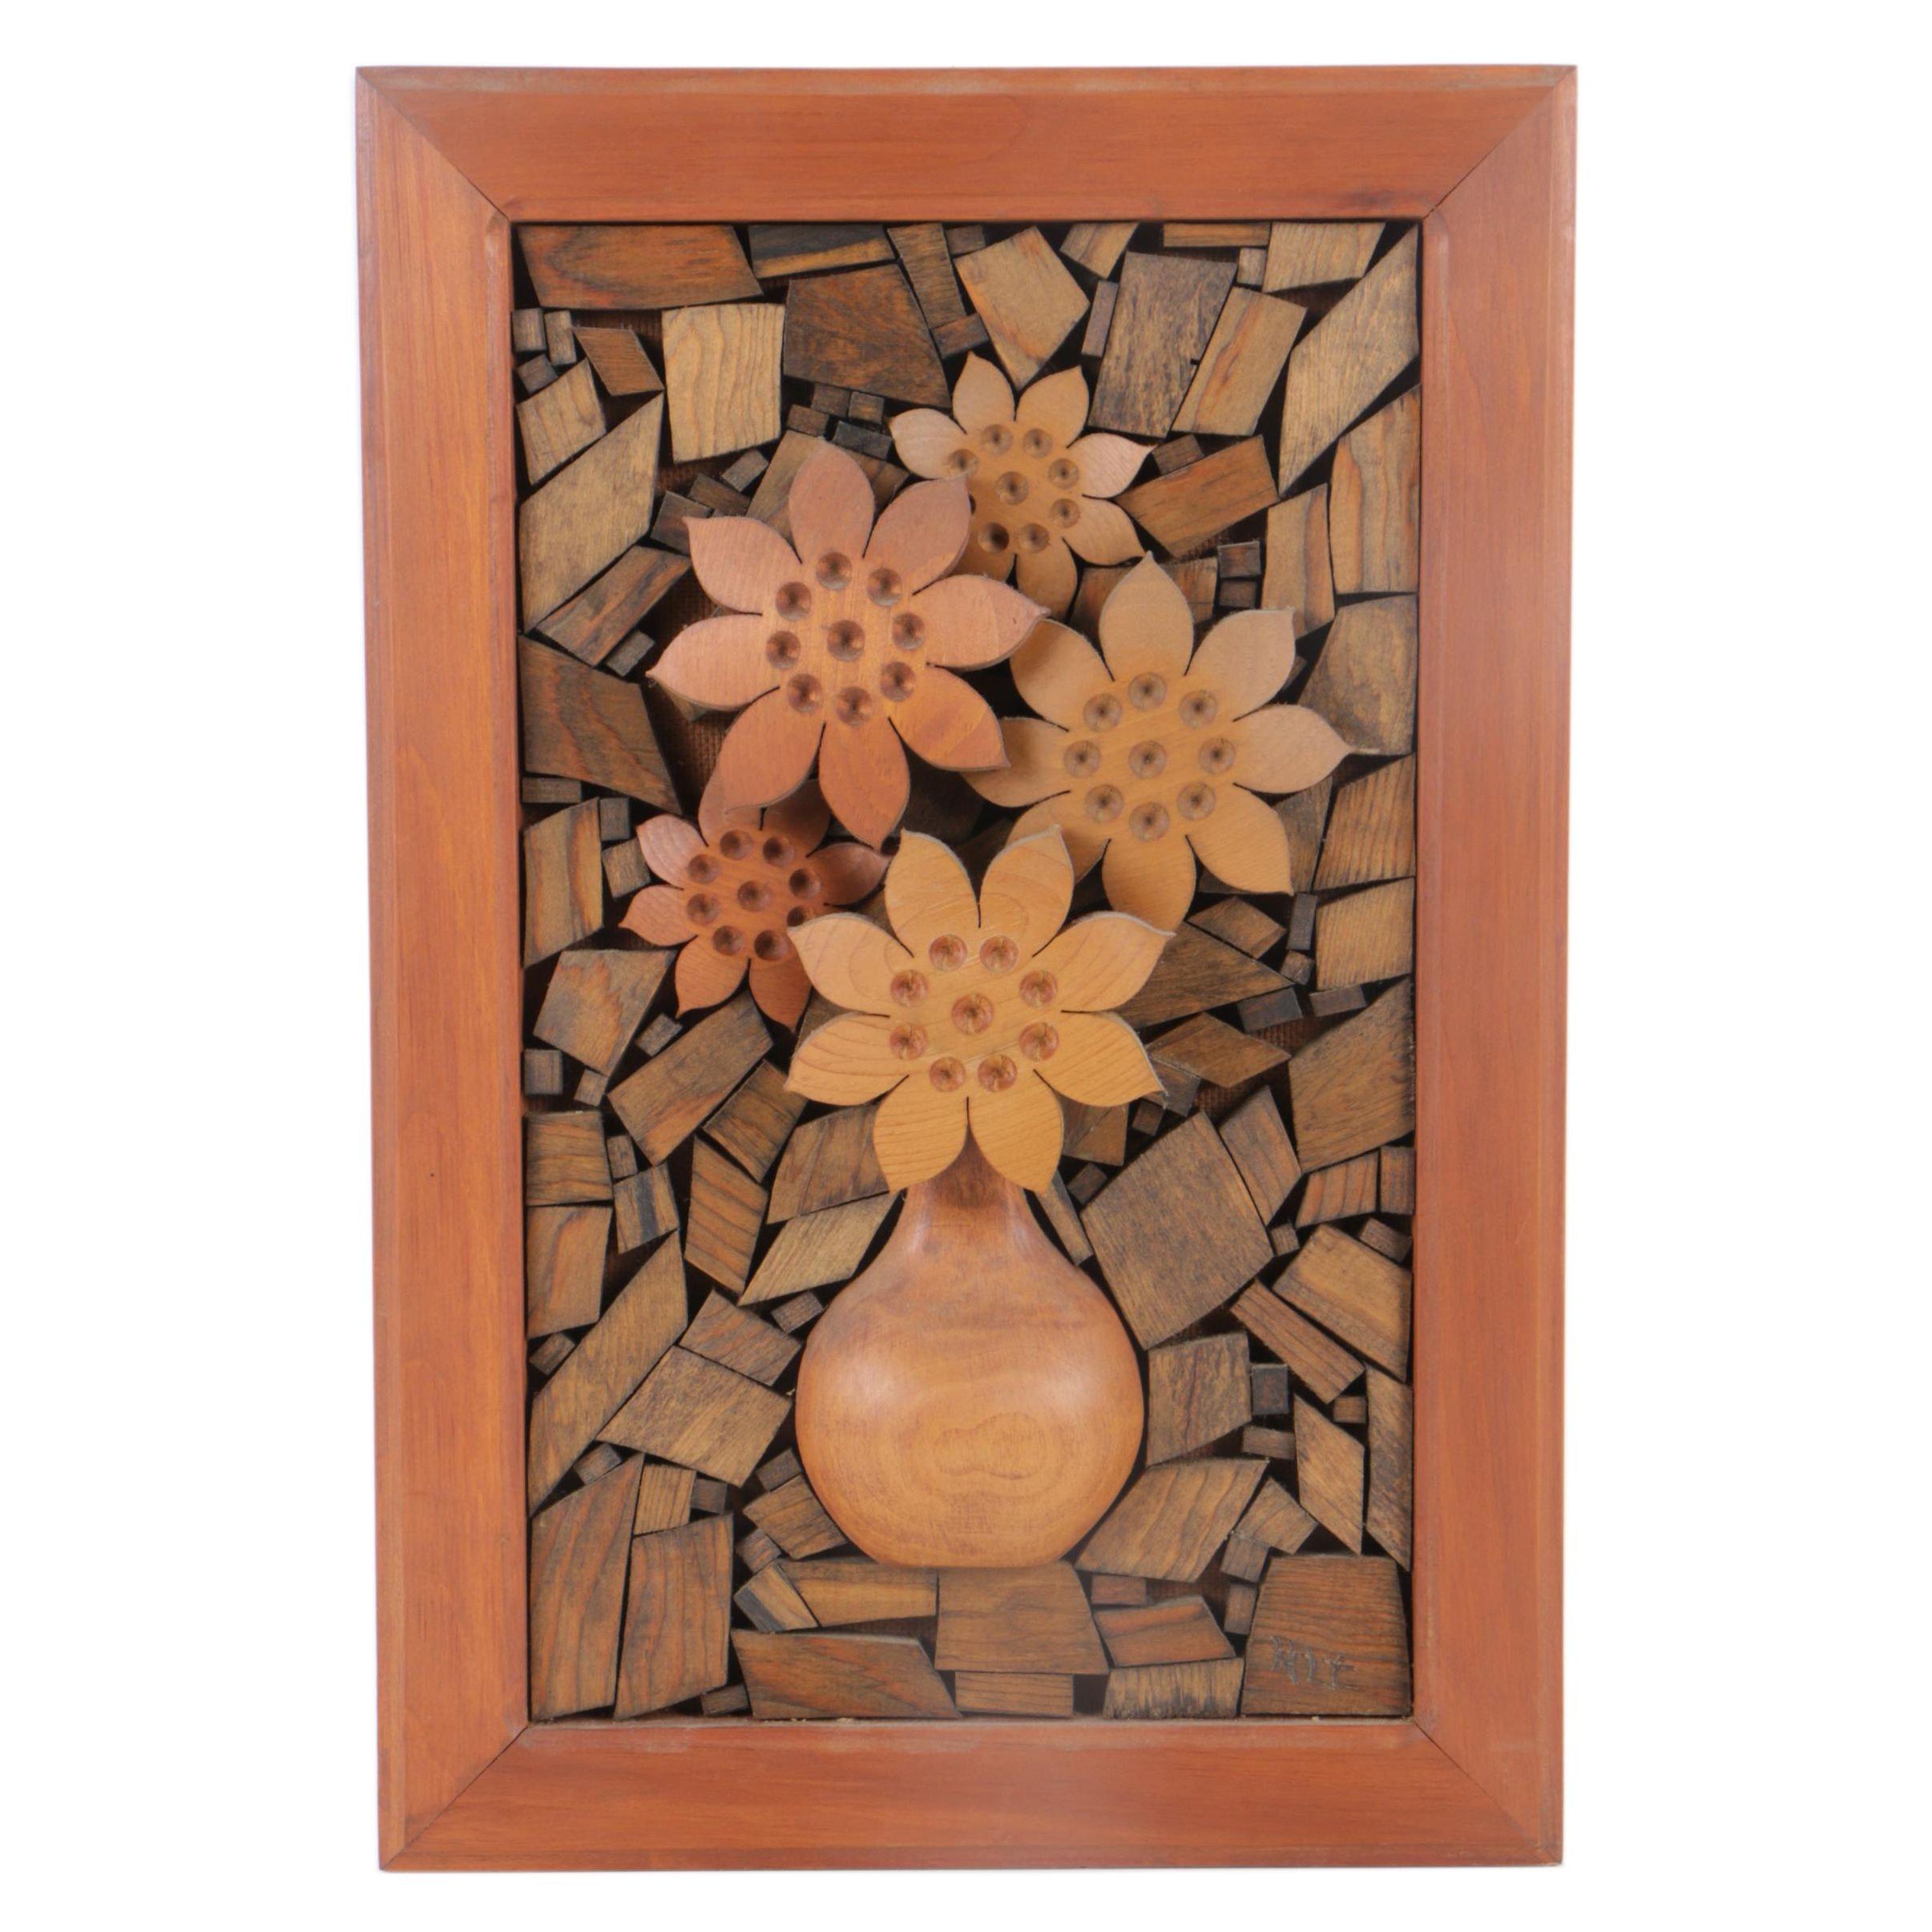 Late 20th Century Wood Mosaic Art